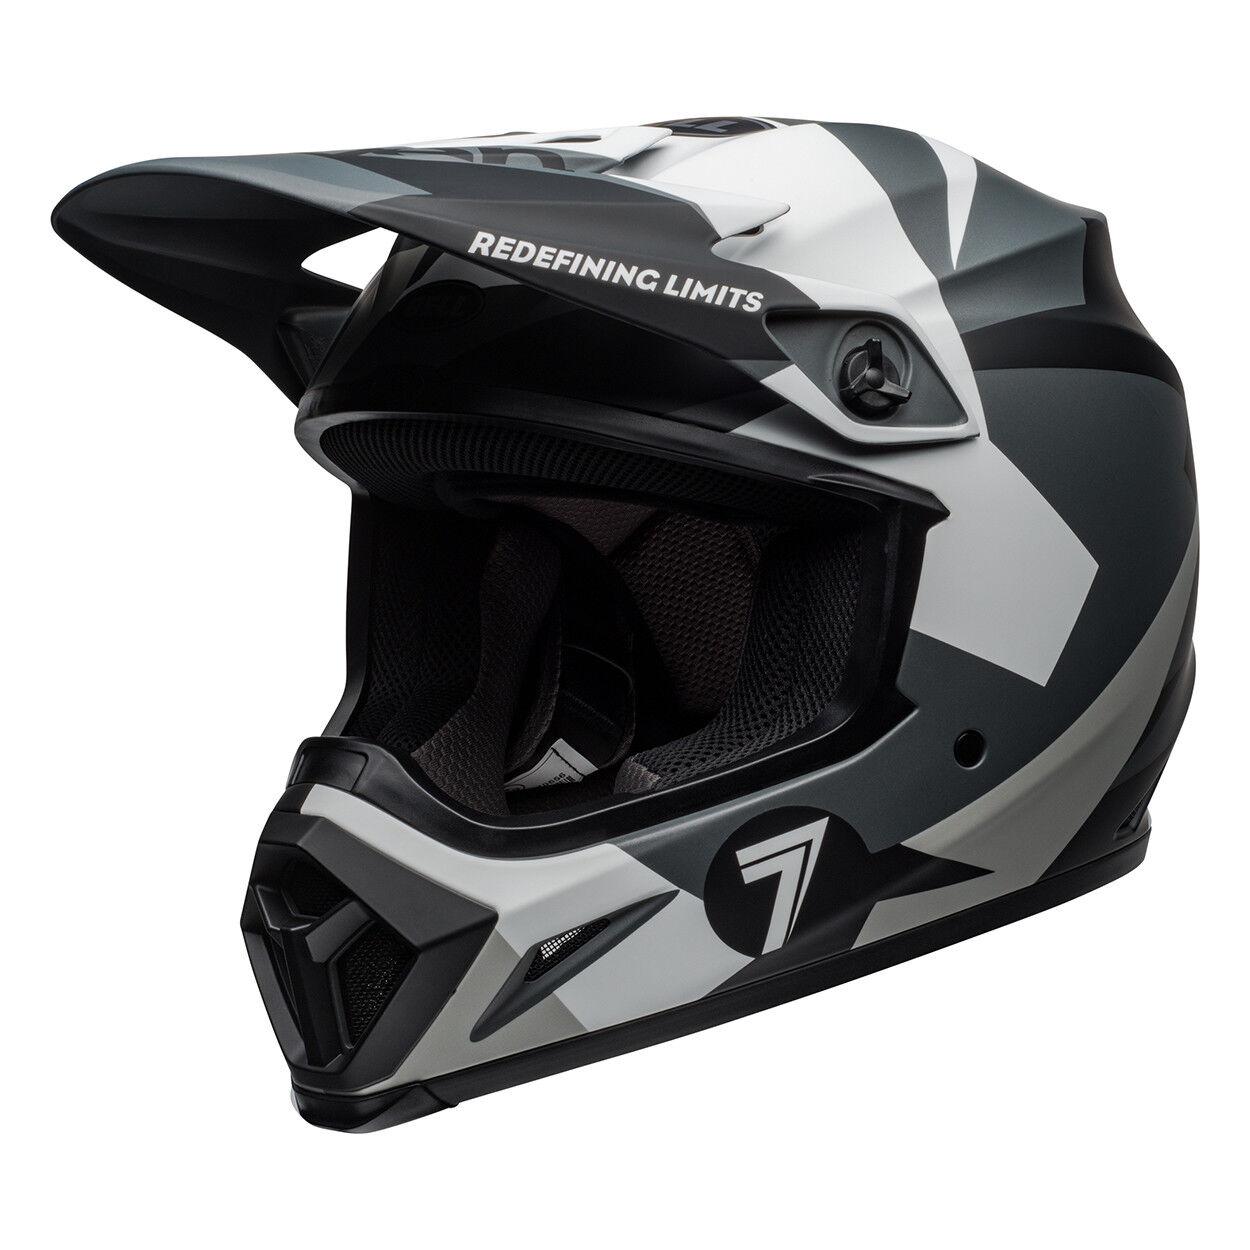 Bell Seven MX 2019 MX-9 MIPS Adult Helmet (Battleship Matte Black/Grey)